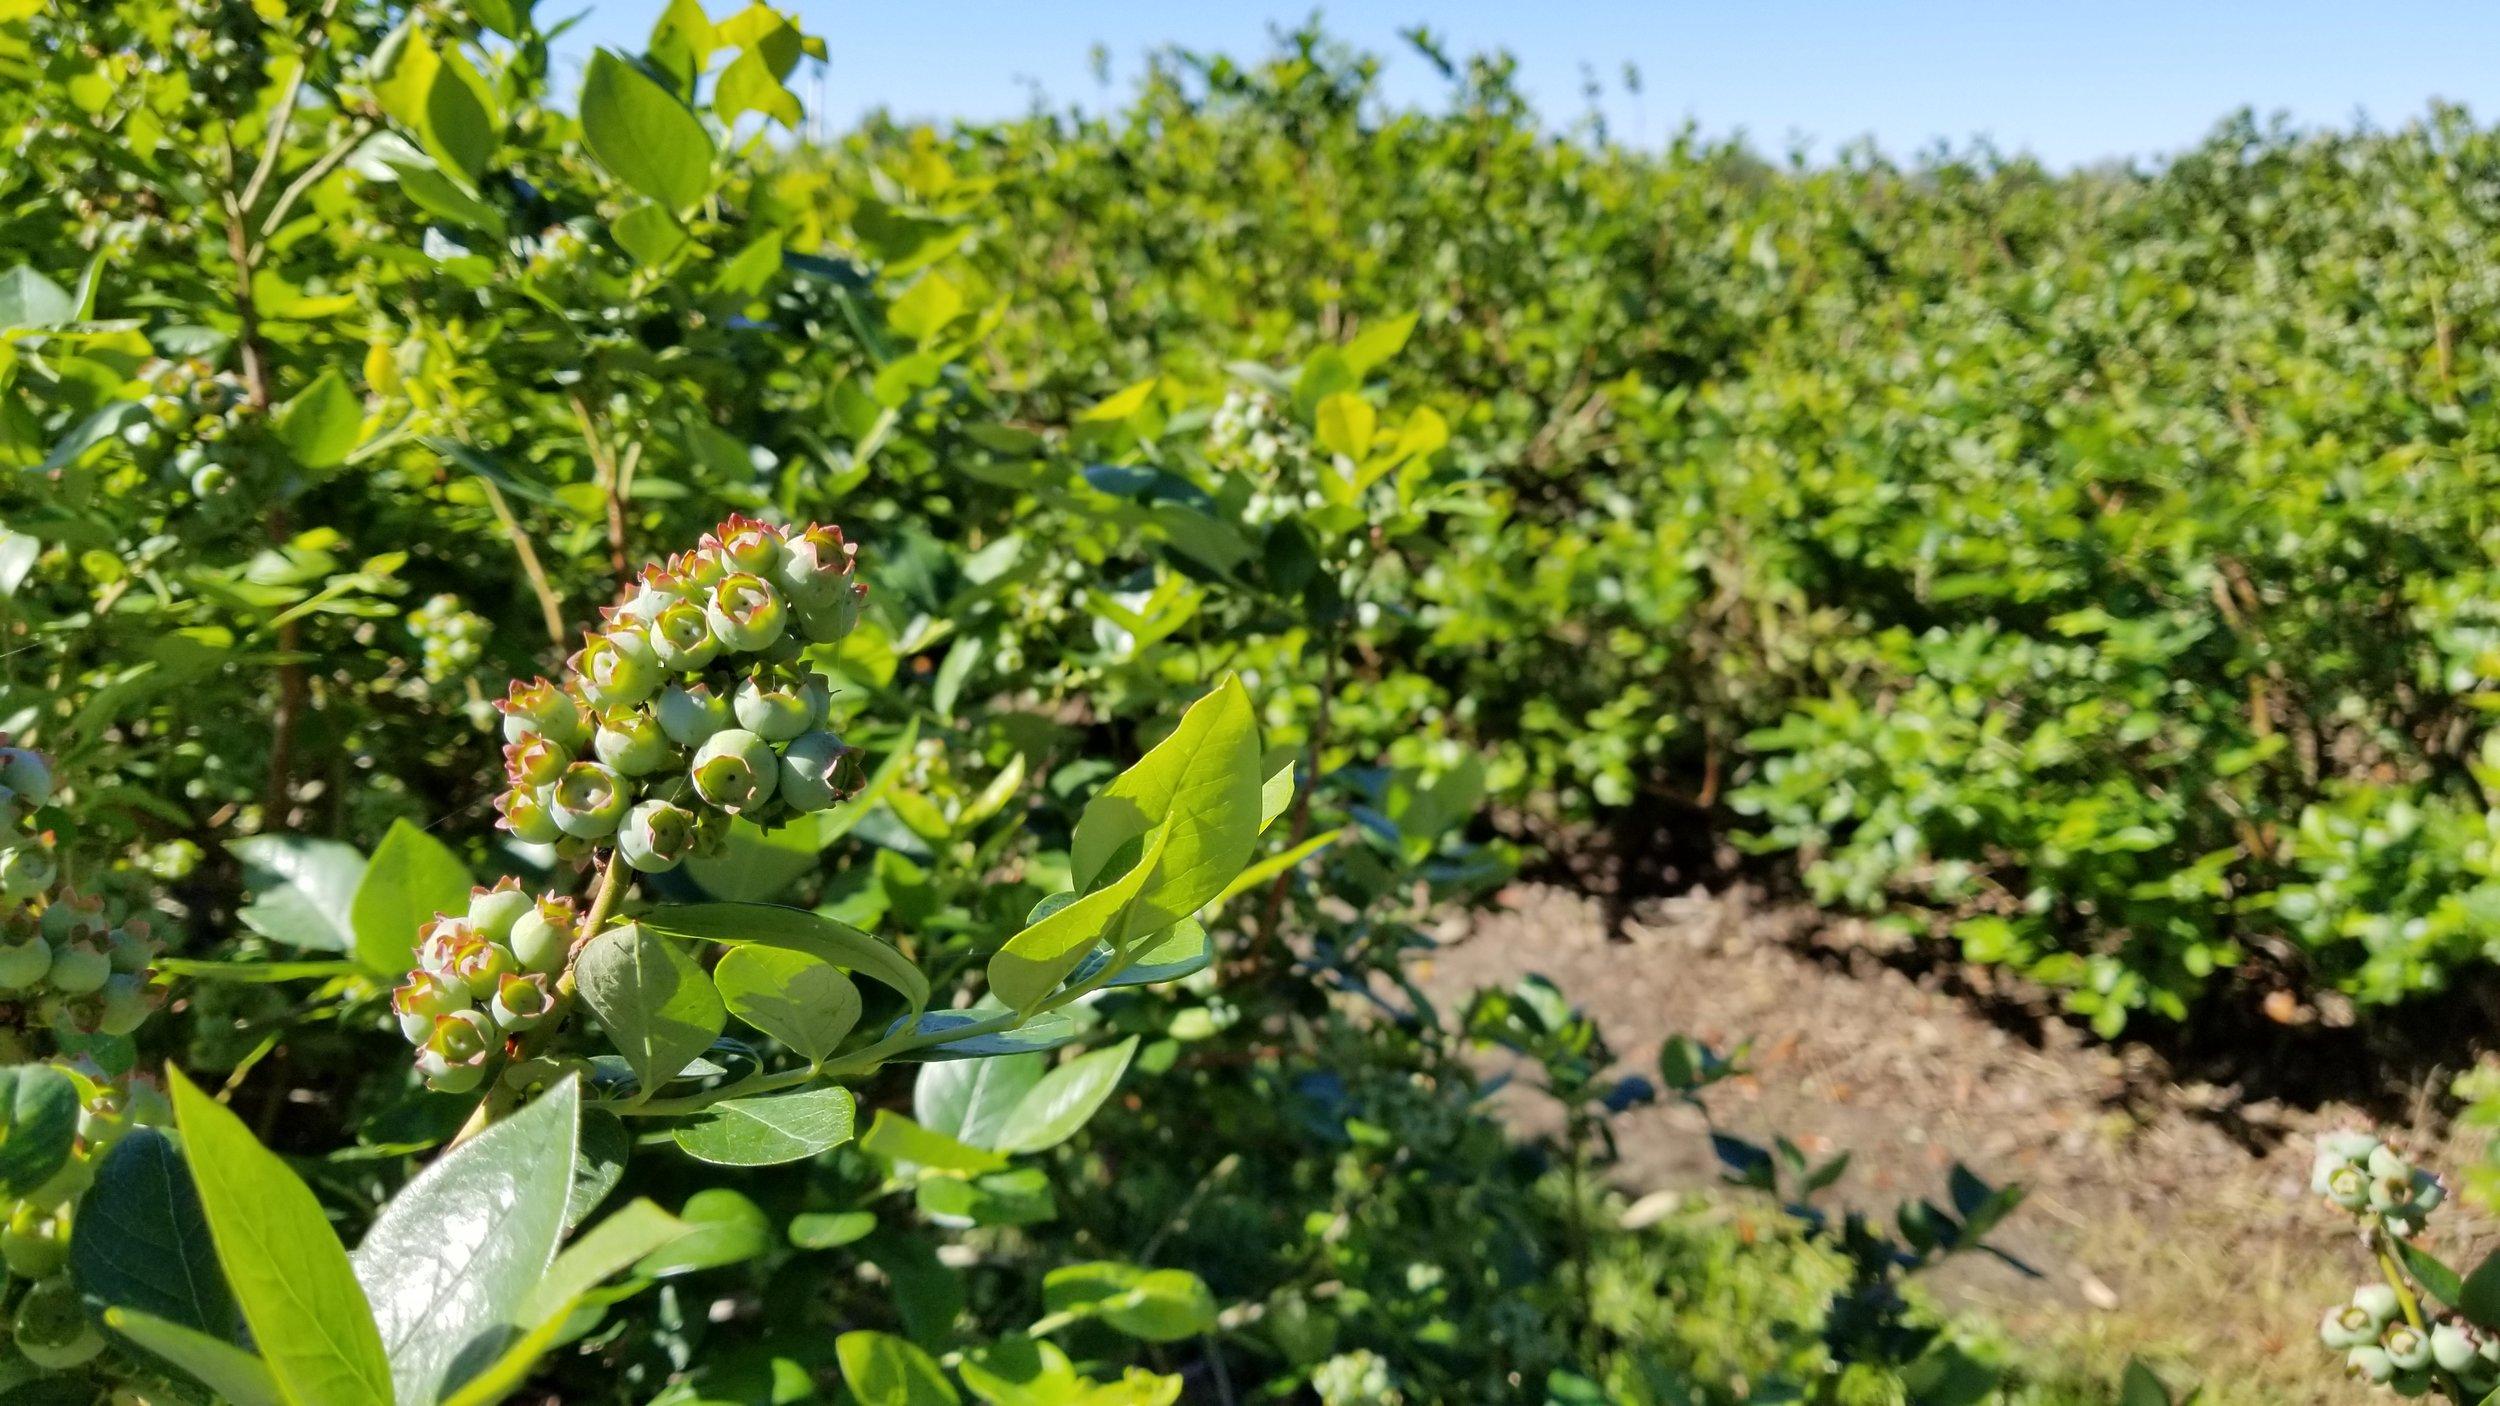 Blueberry bushes at Red, White & Blues Farm in Williston, Florida